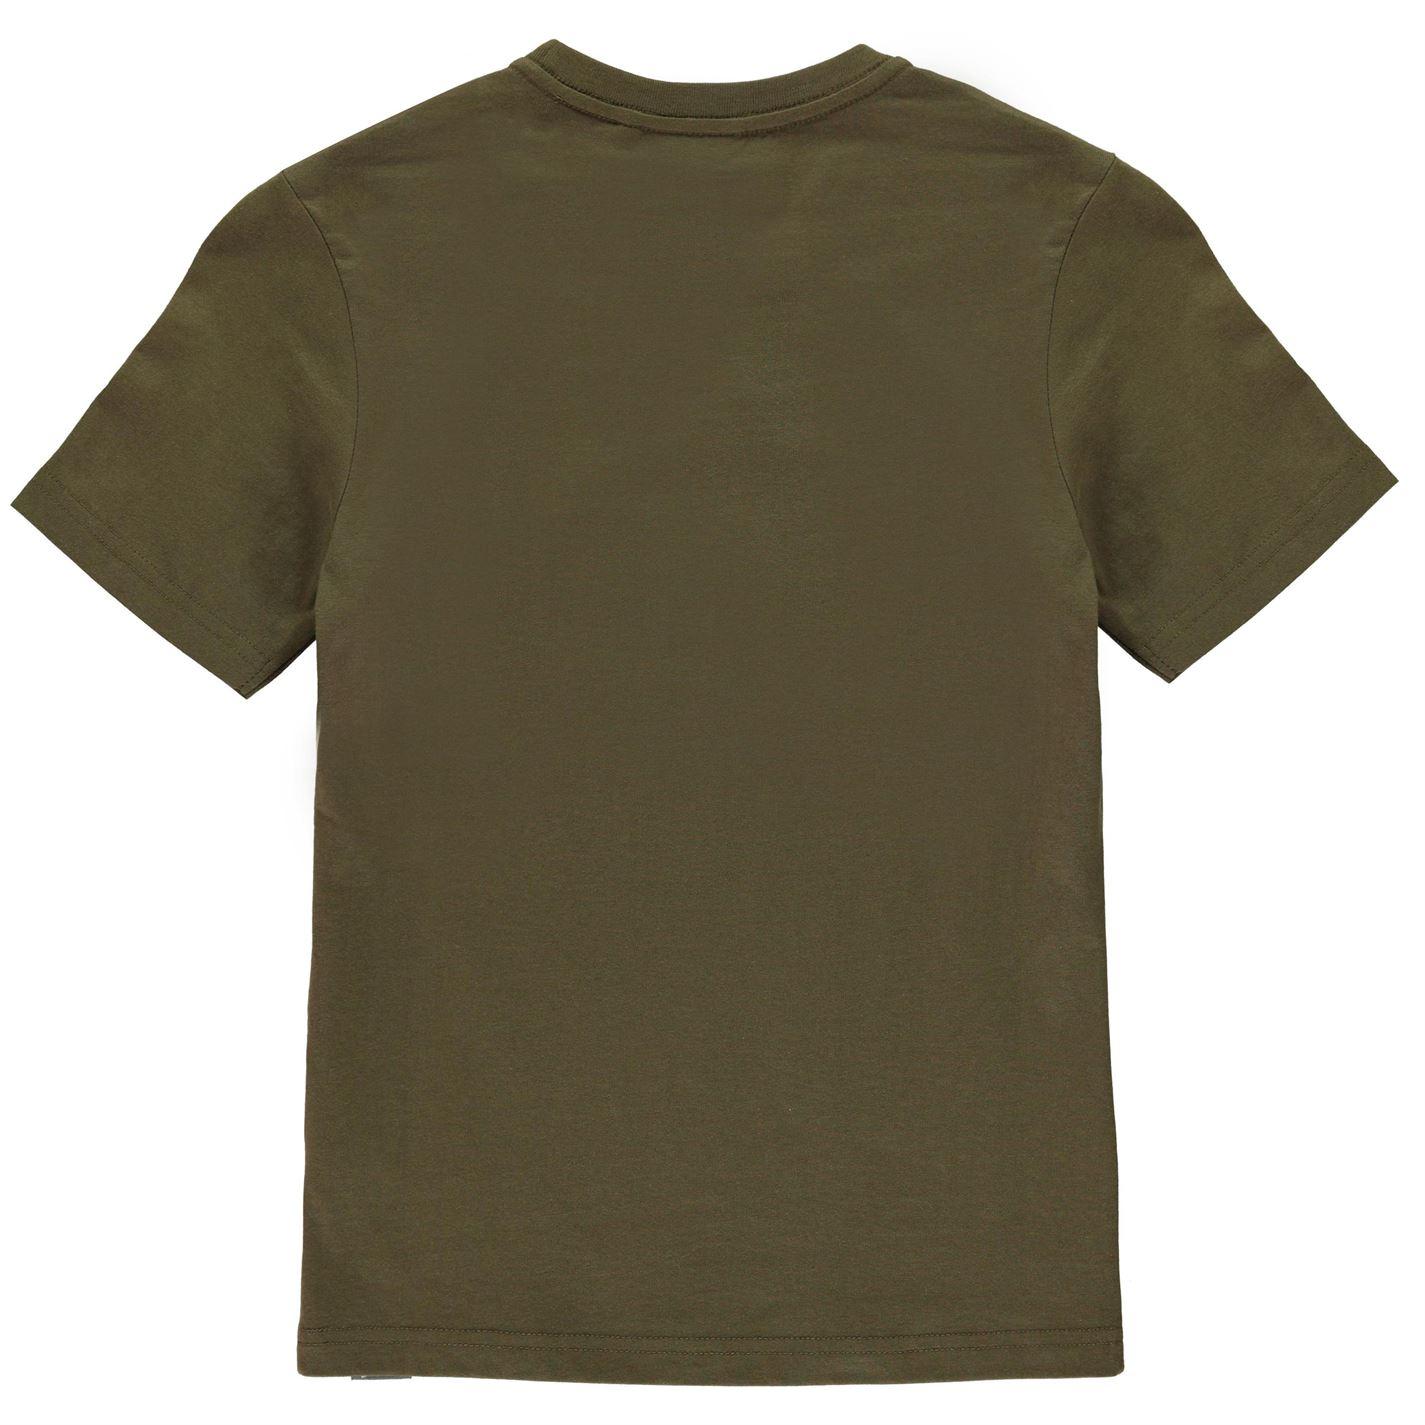 Everlast T Shirt Youngster per Bambini Girocollo Tee Top manica corta cotone stamp